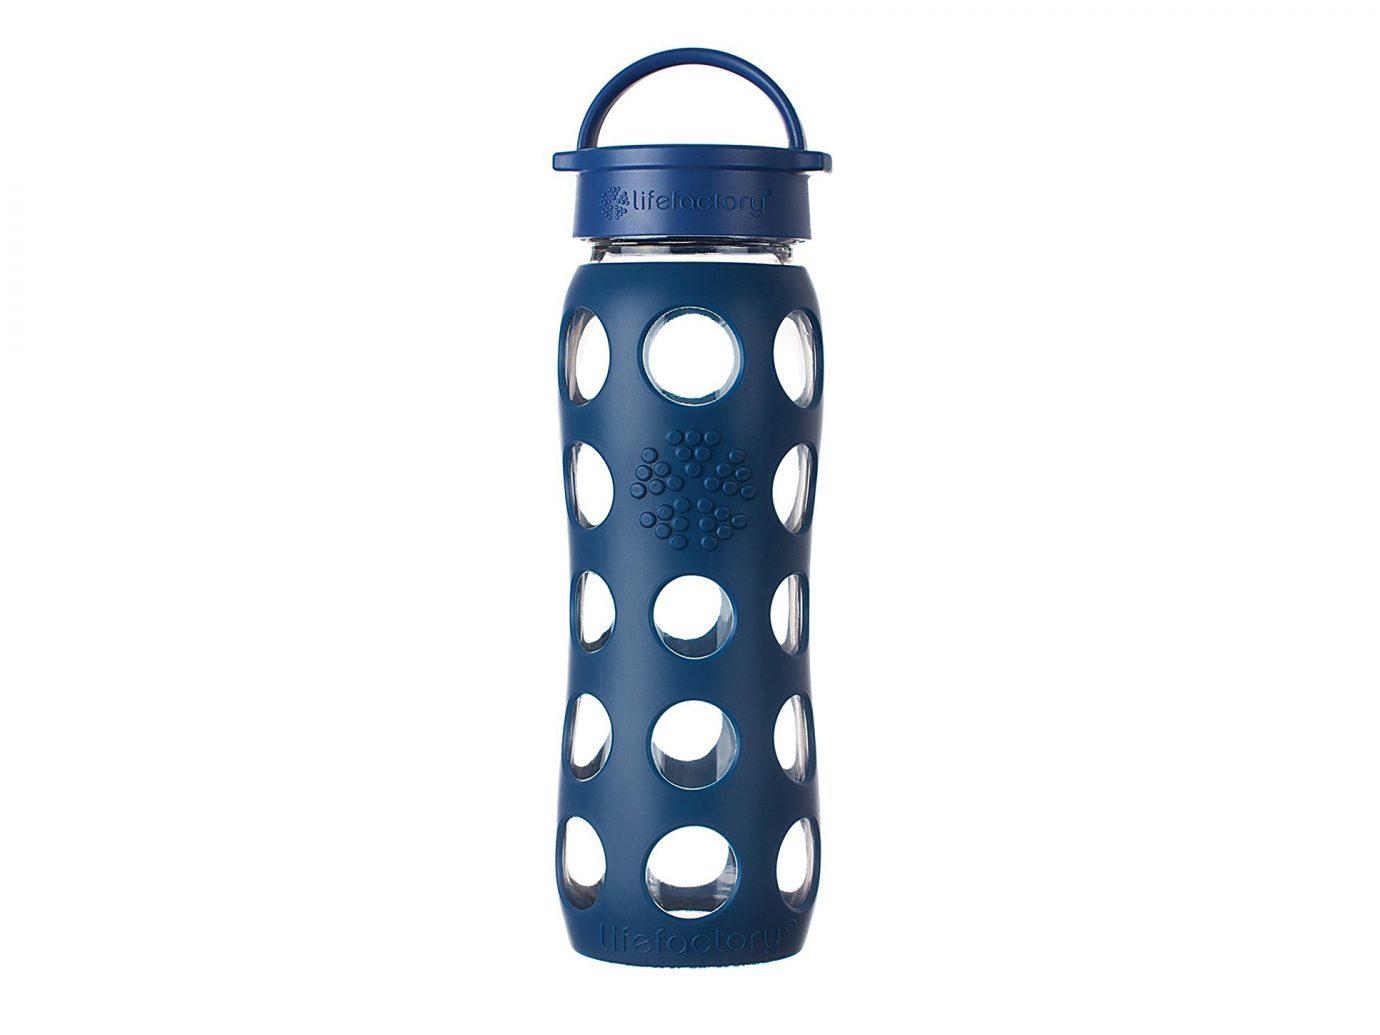 Lifefactory Beverage Bottle